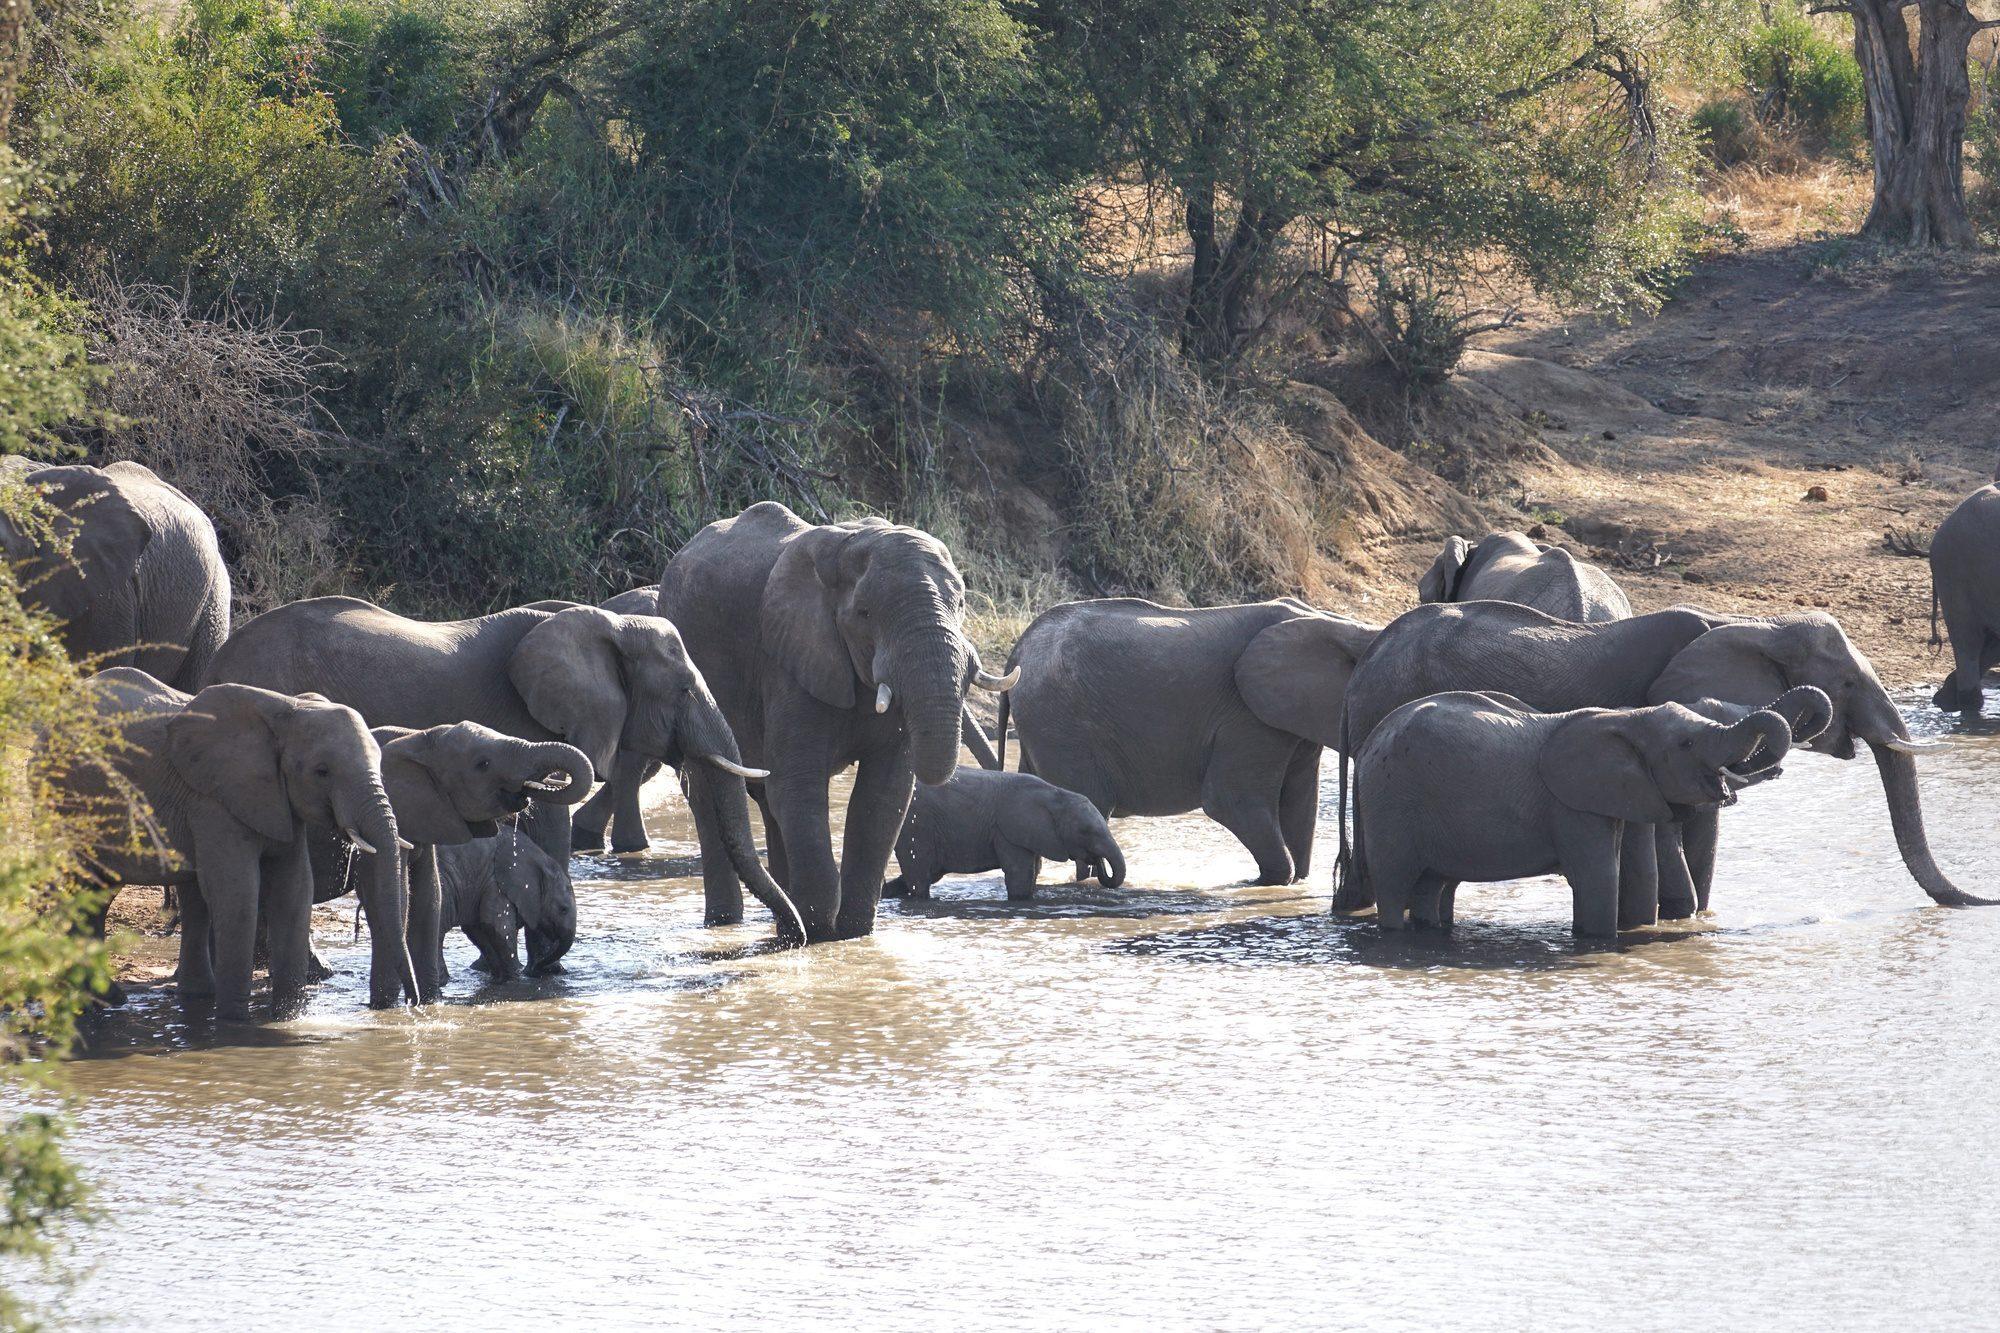 Elephants at Kruger National Park in South Africa